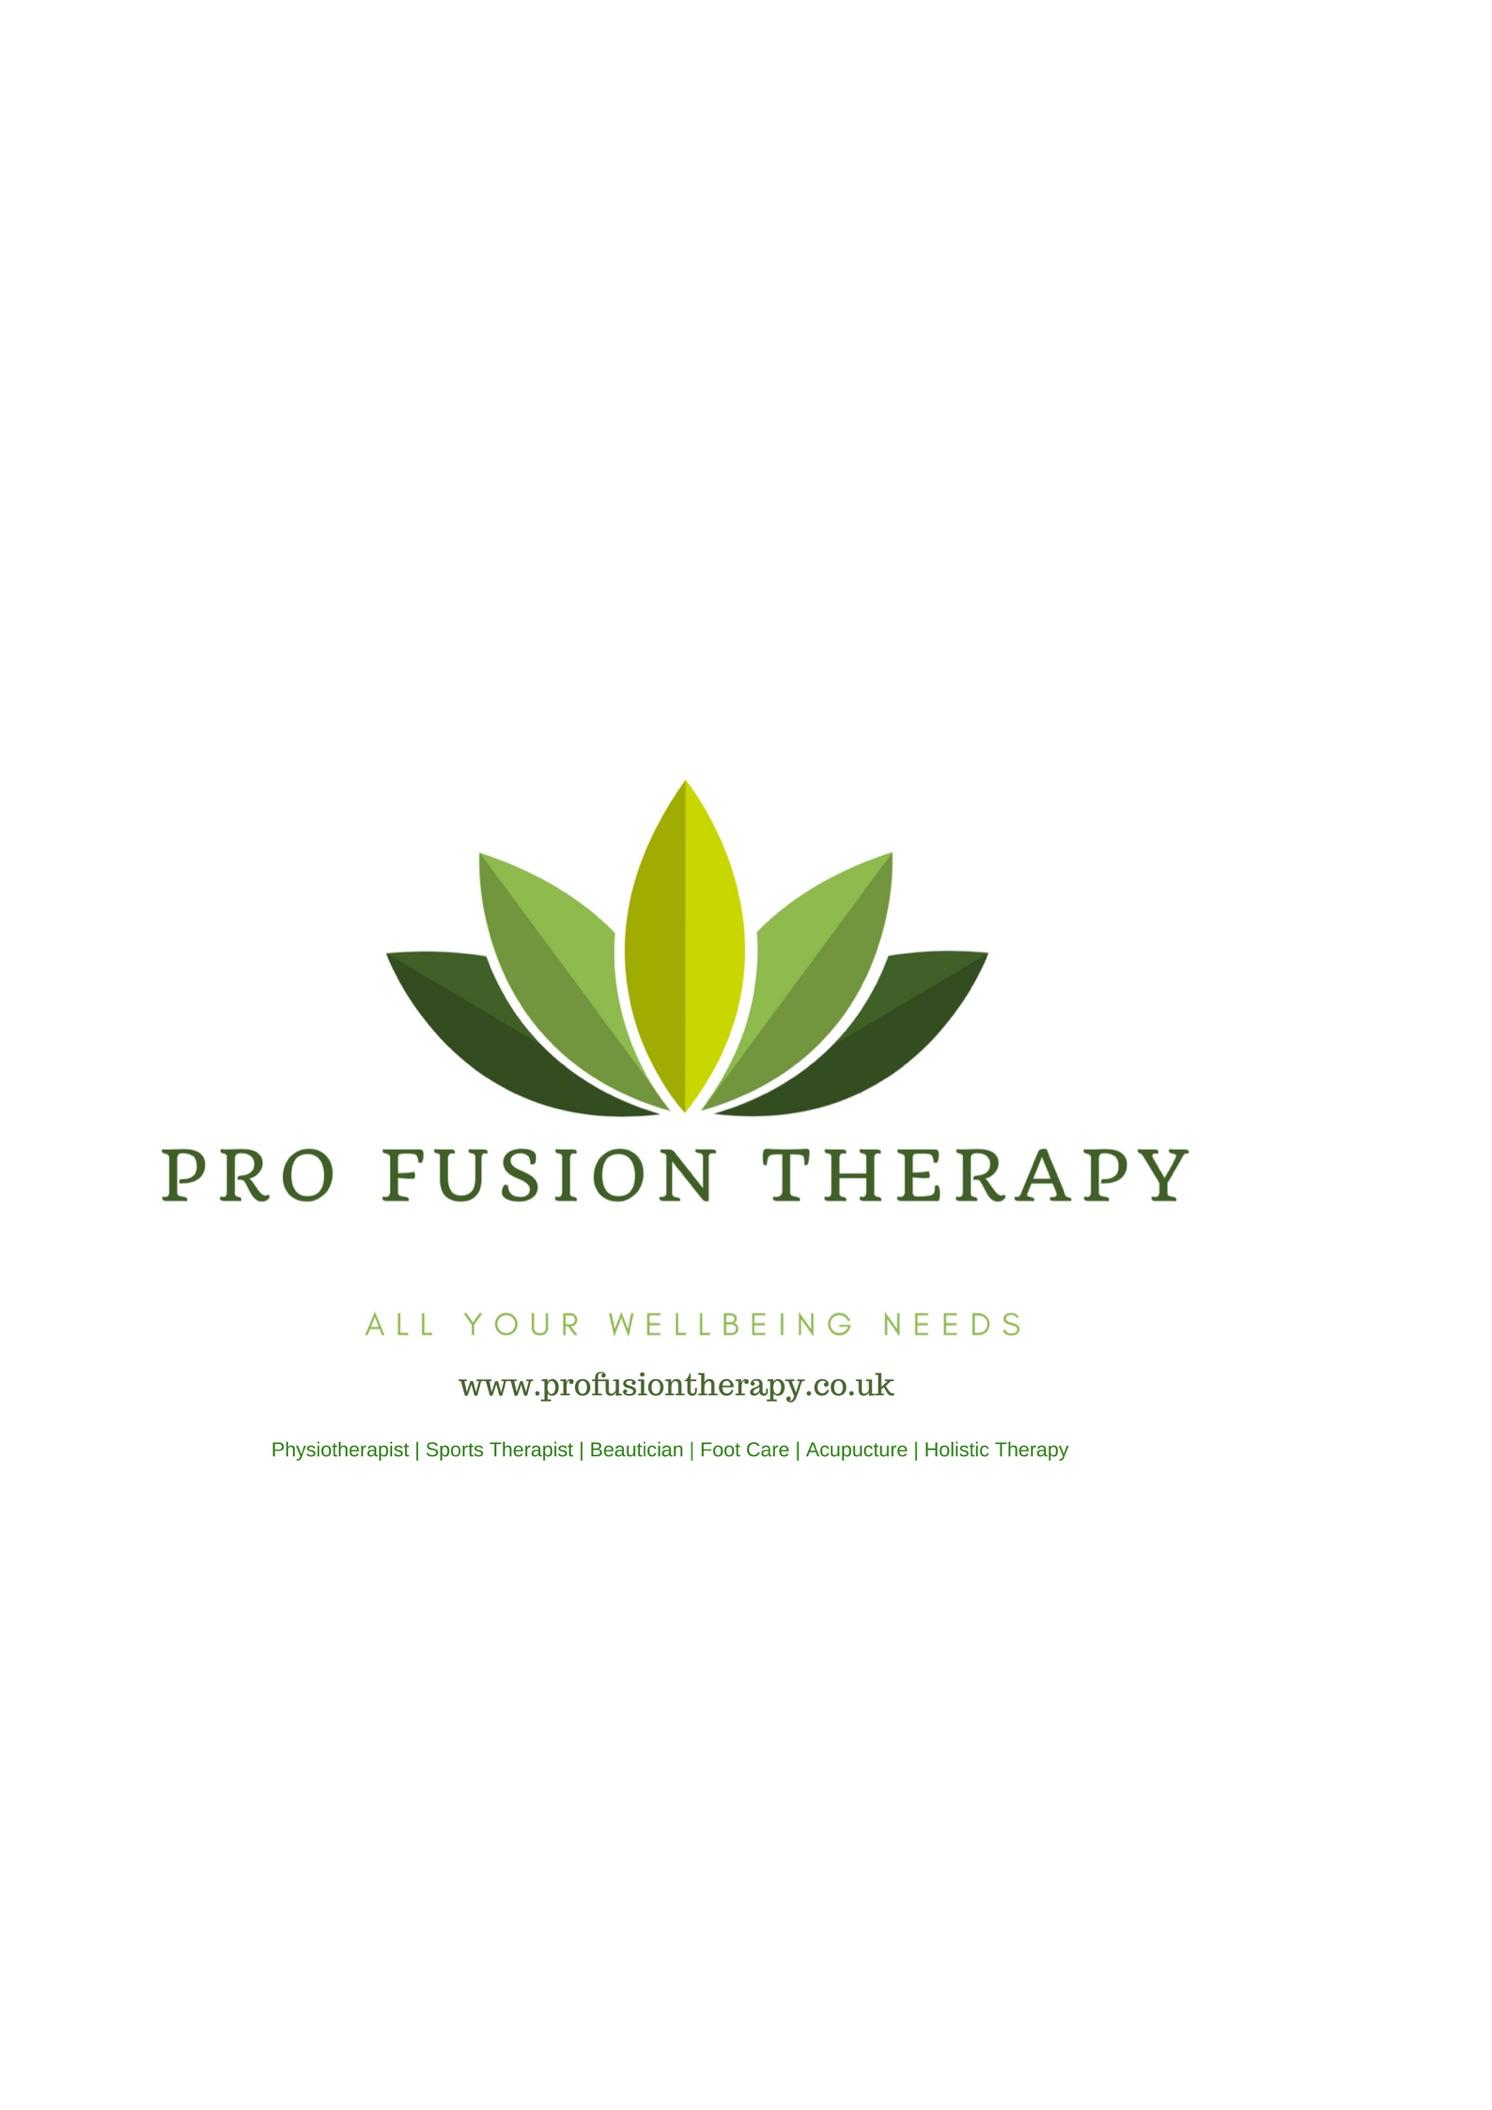 Pro Fusion Therapy company logo